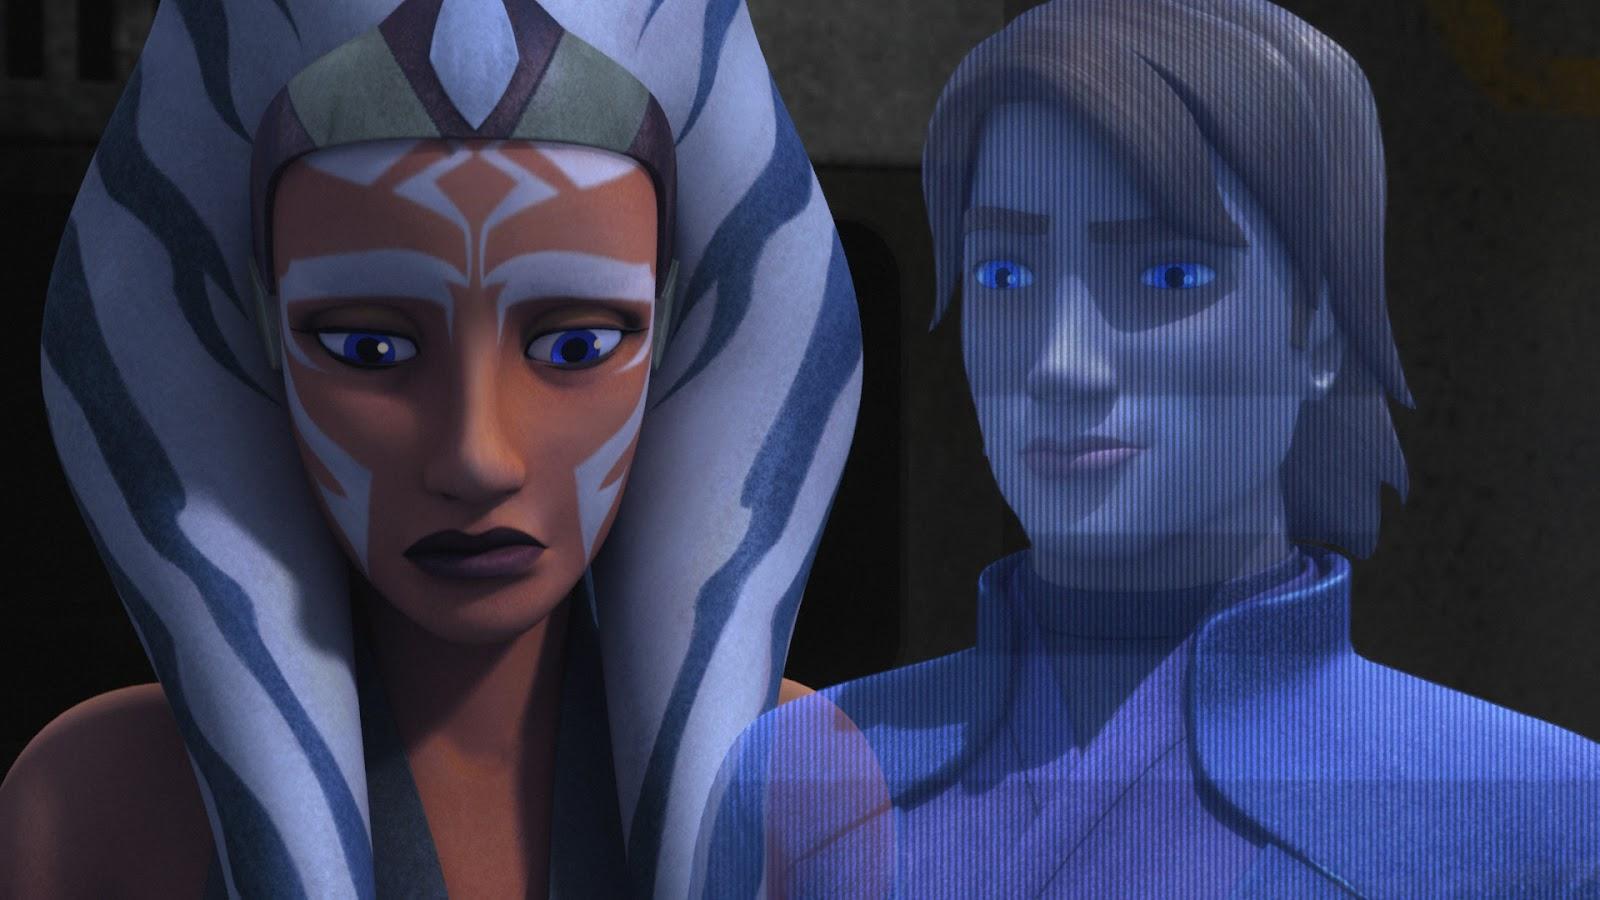 star wars rebels 3x20 soles gemelos